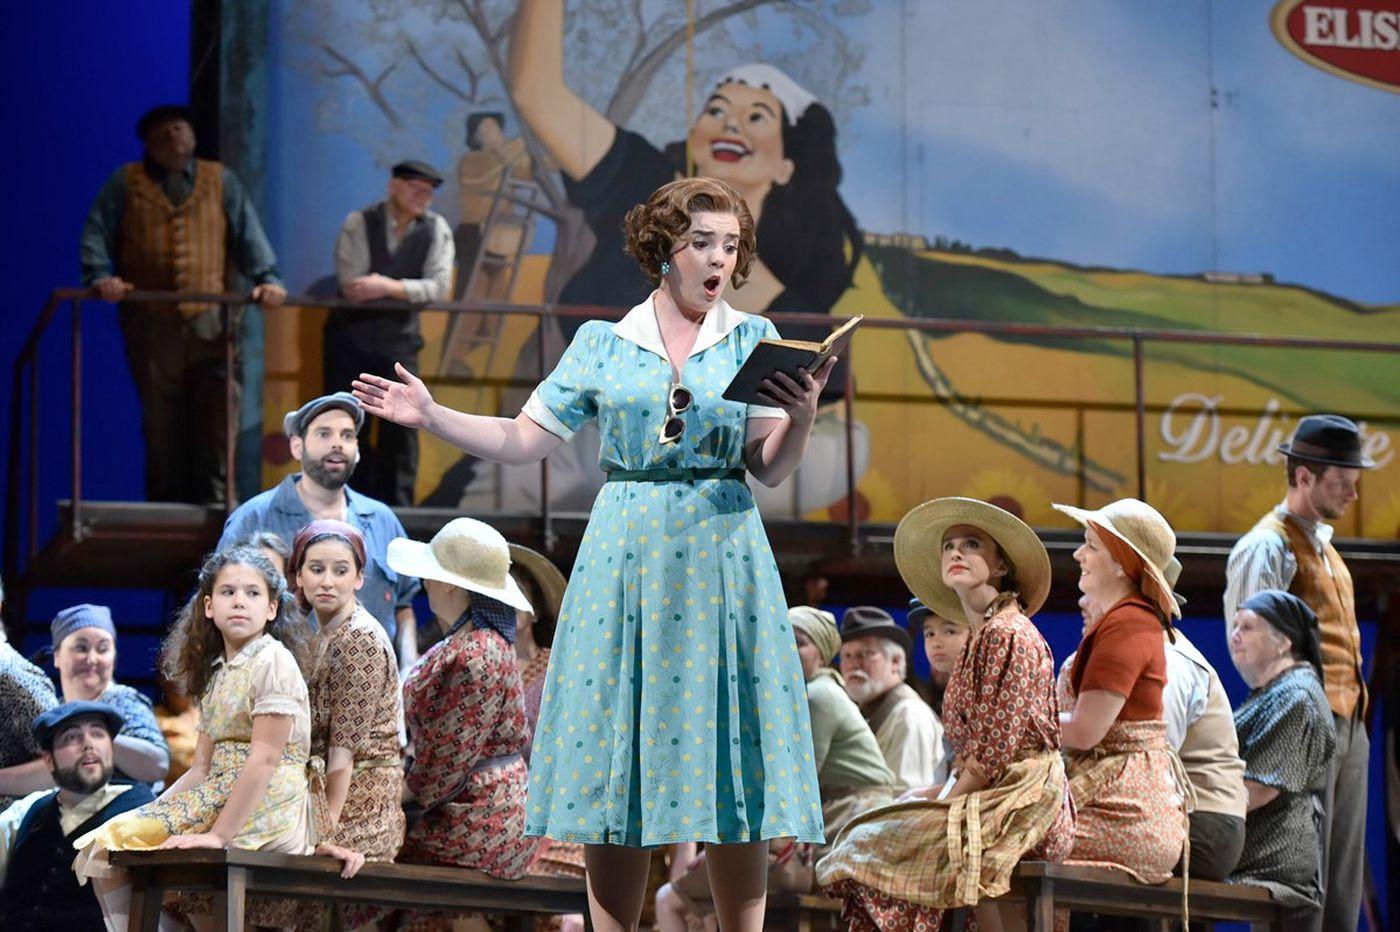 Sarah Shafer's crystalline voice graces Opera Philadelphia